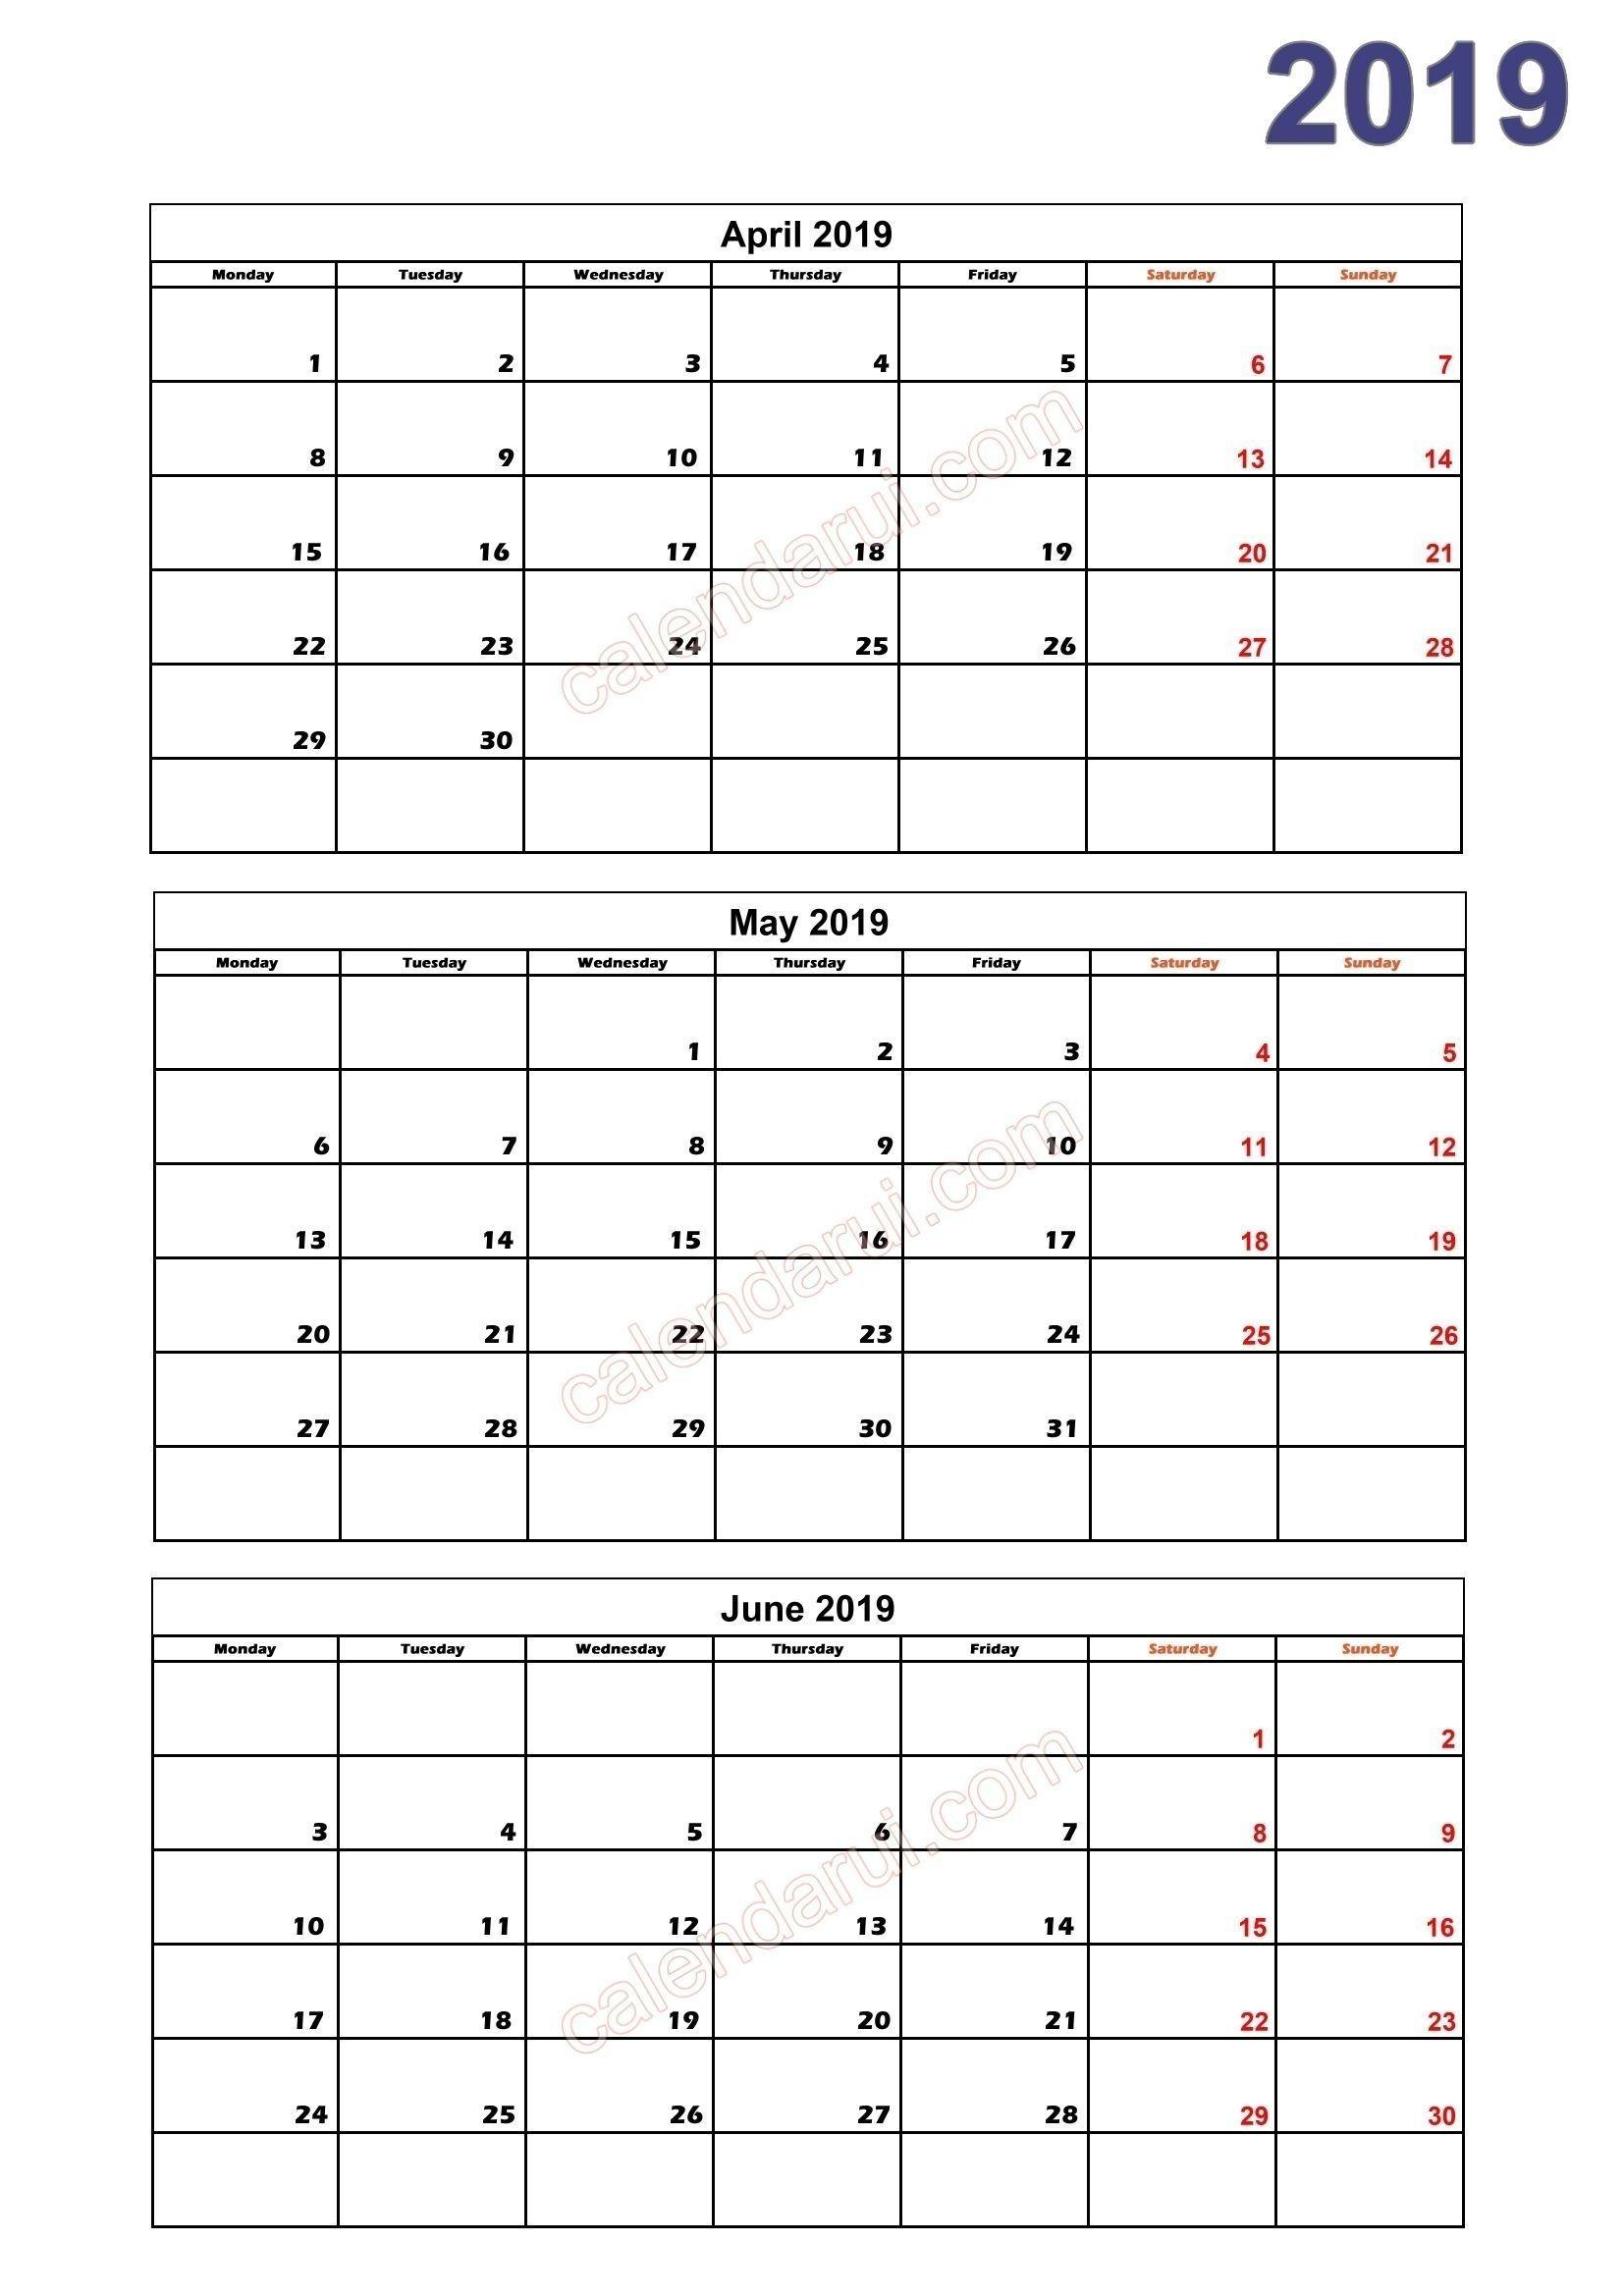 Get Free 2019 3 Month Calendar Templates Printable Download Monthly Calendar Template Blank Monthly Calendar Template Printable Calendar Pages